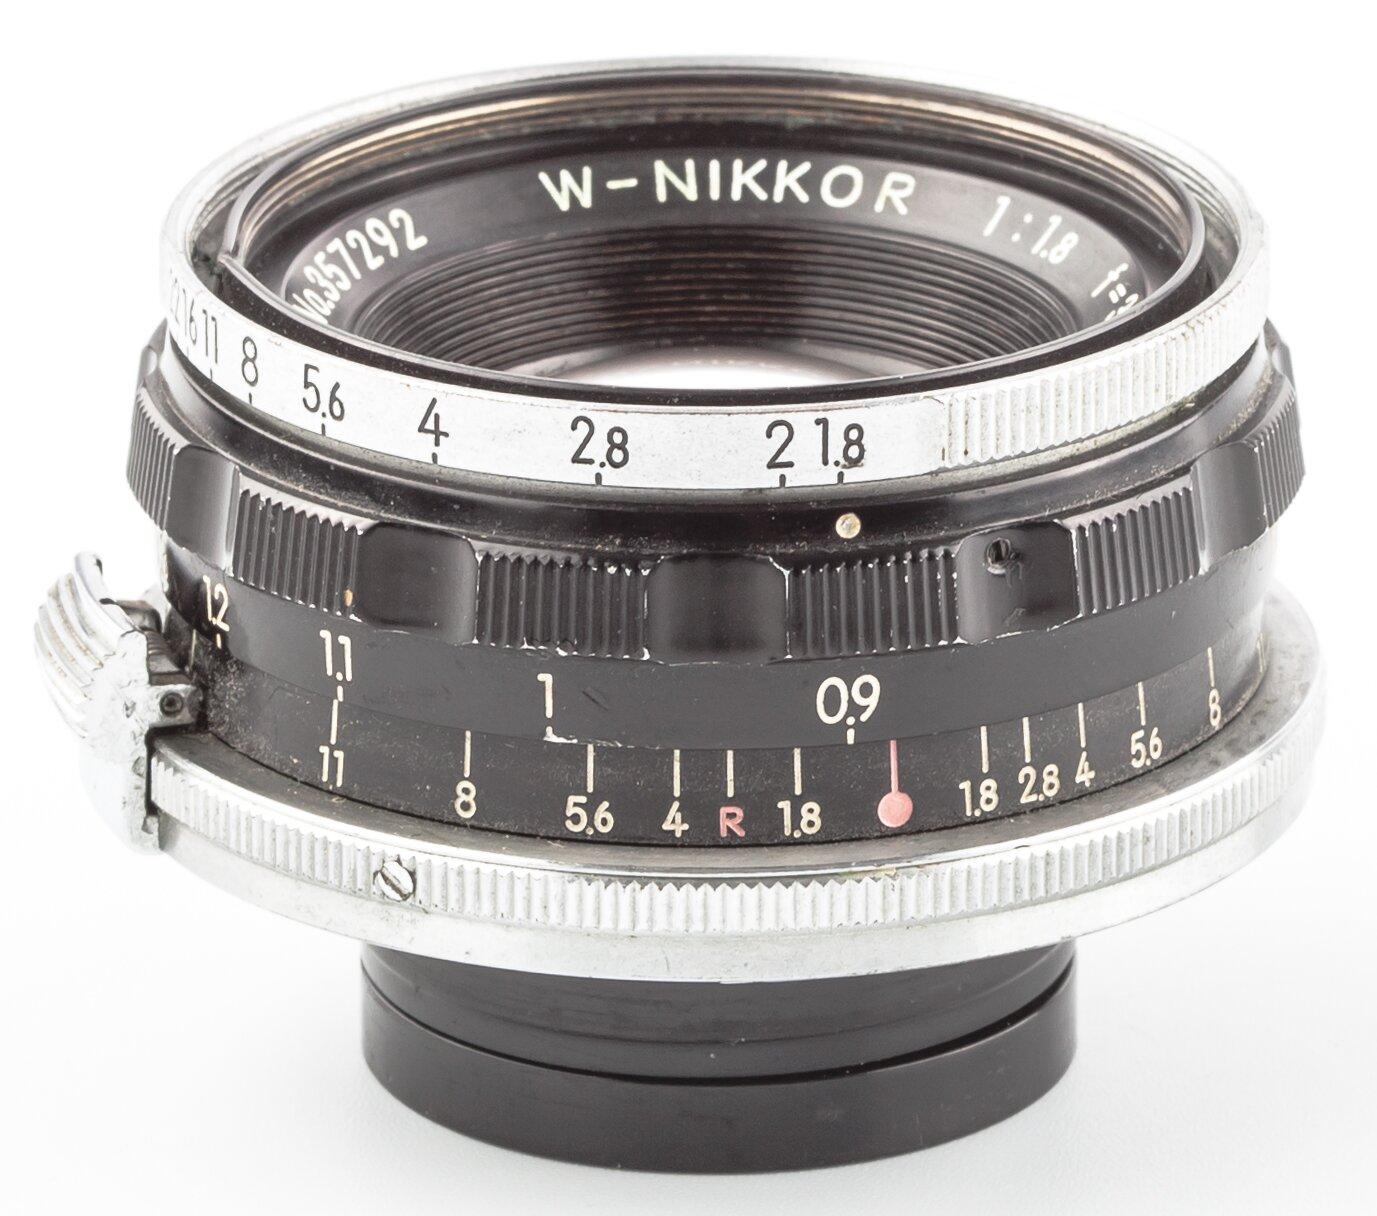 Nikon RF 1,8/3,5cm W-Nikkor Nippon Kogaku